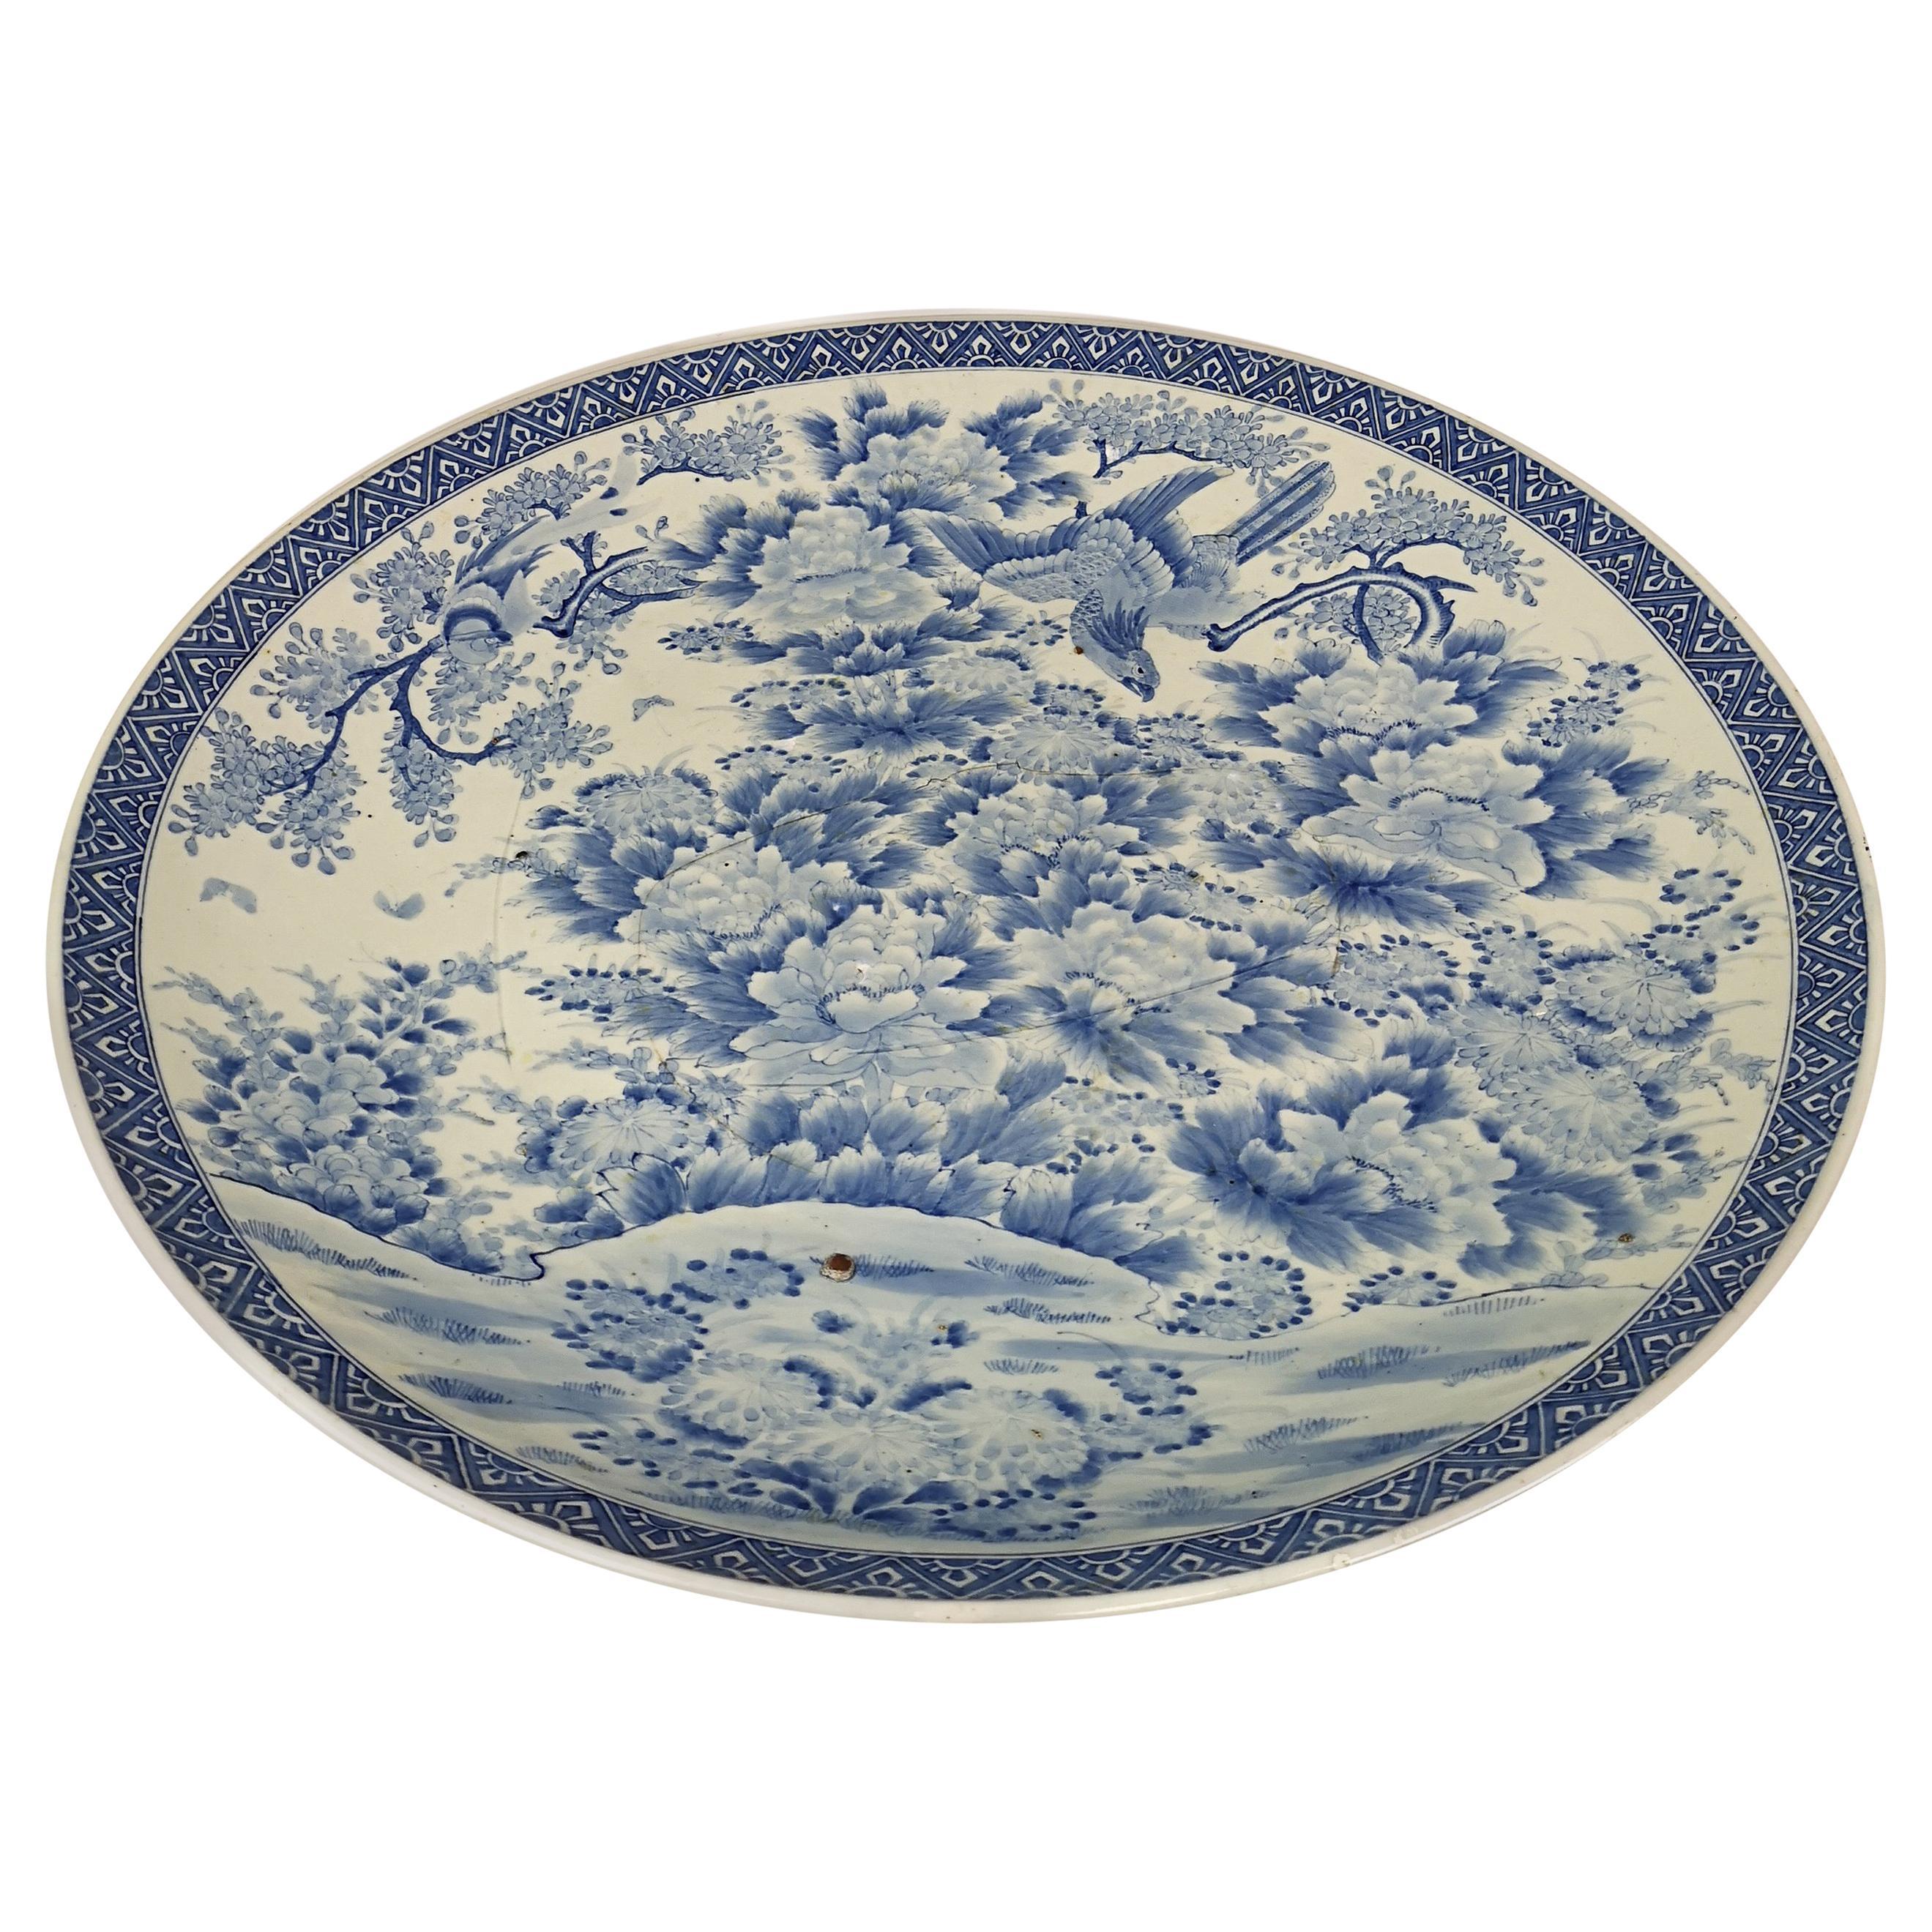 Massive Antique Japanese Arita Porcelain Emperor Meiji